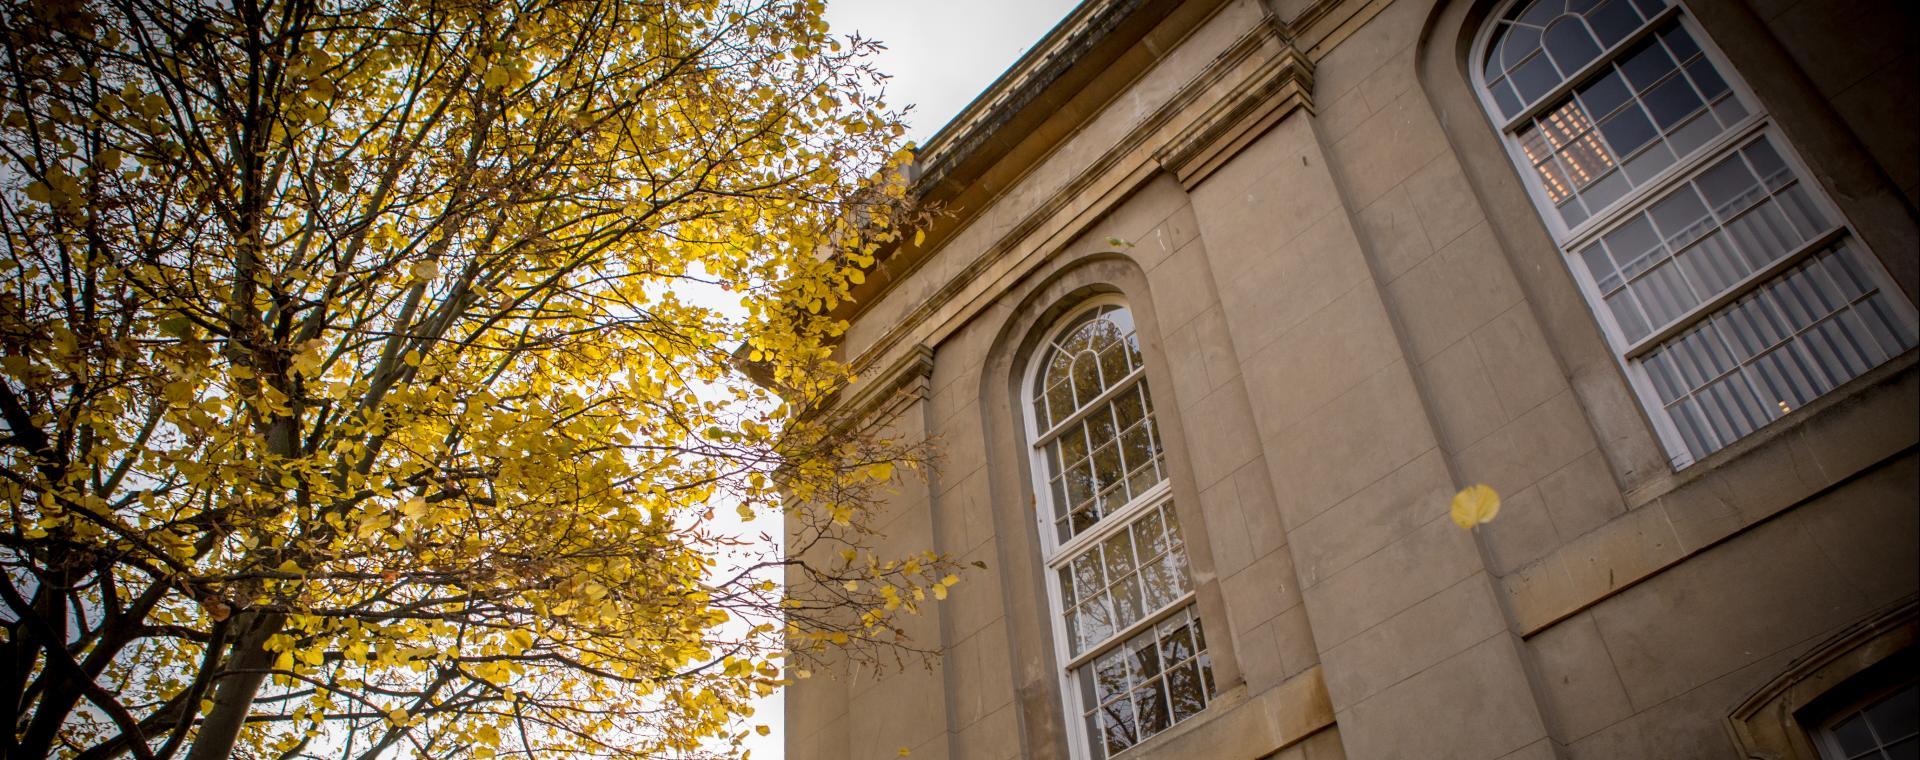 Autumnal tree outside Brunwick Court, Bristol